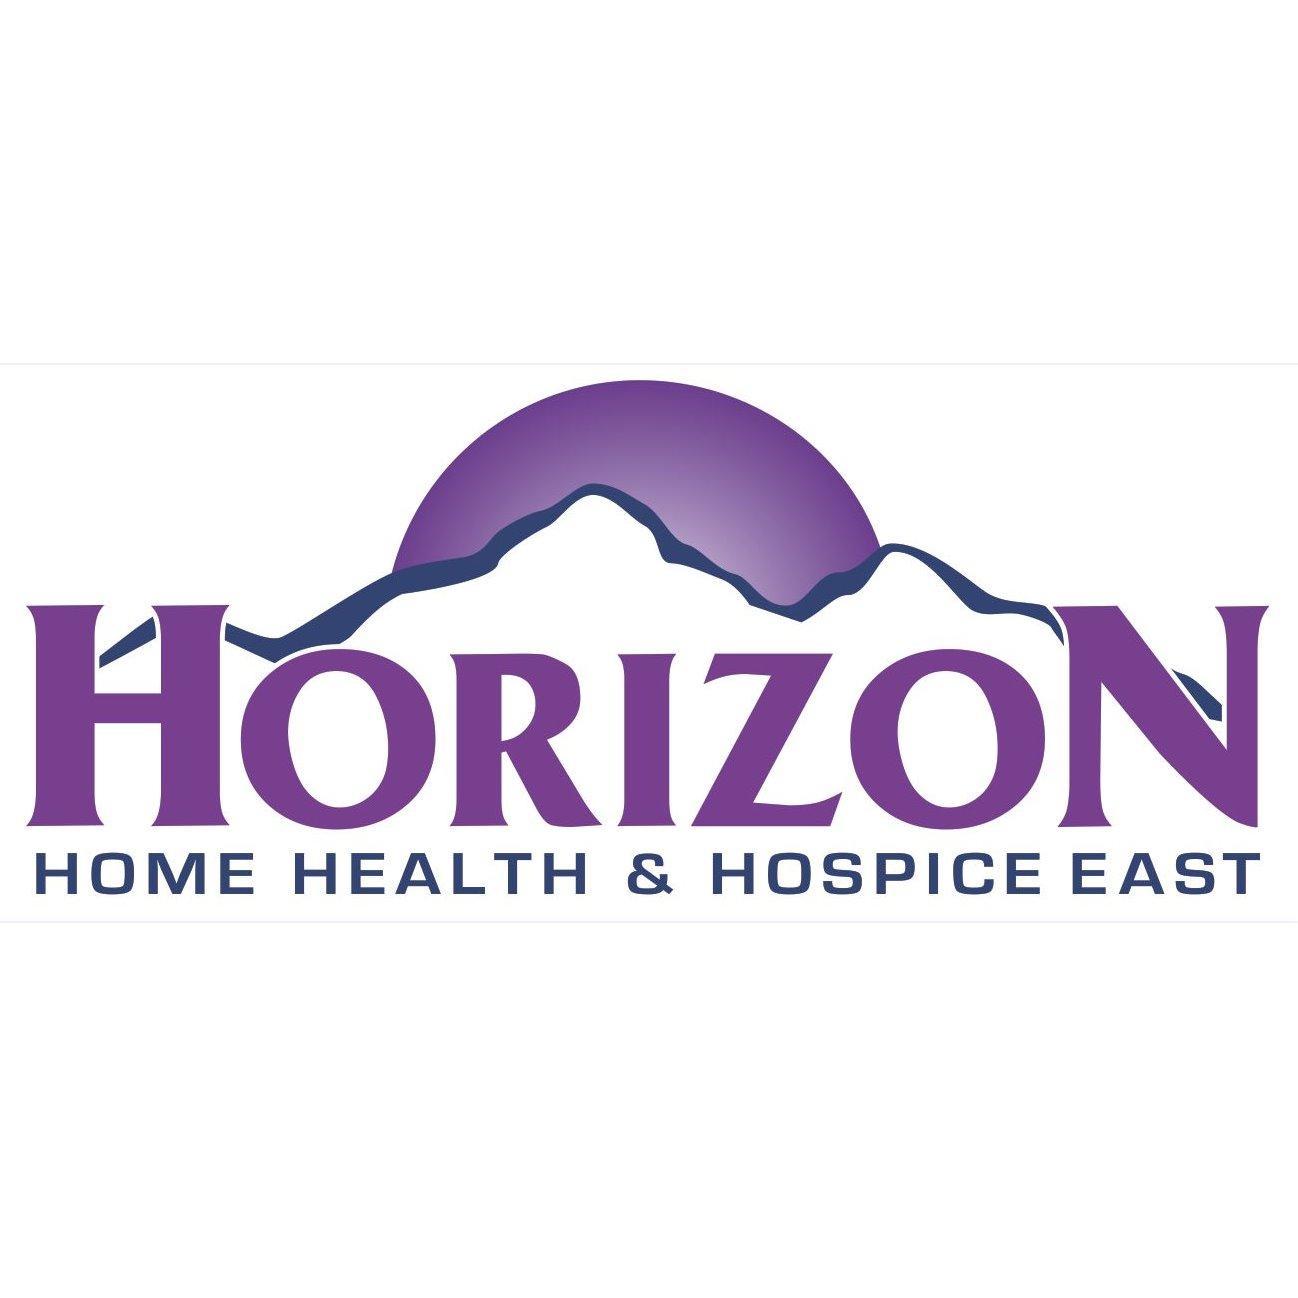 Horizon Home Health & Hospice East image 4